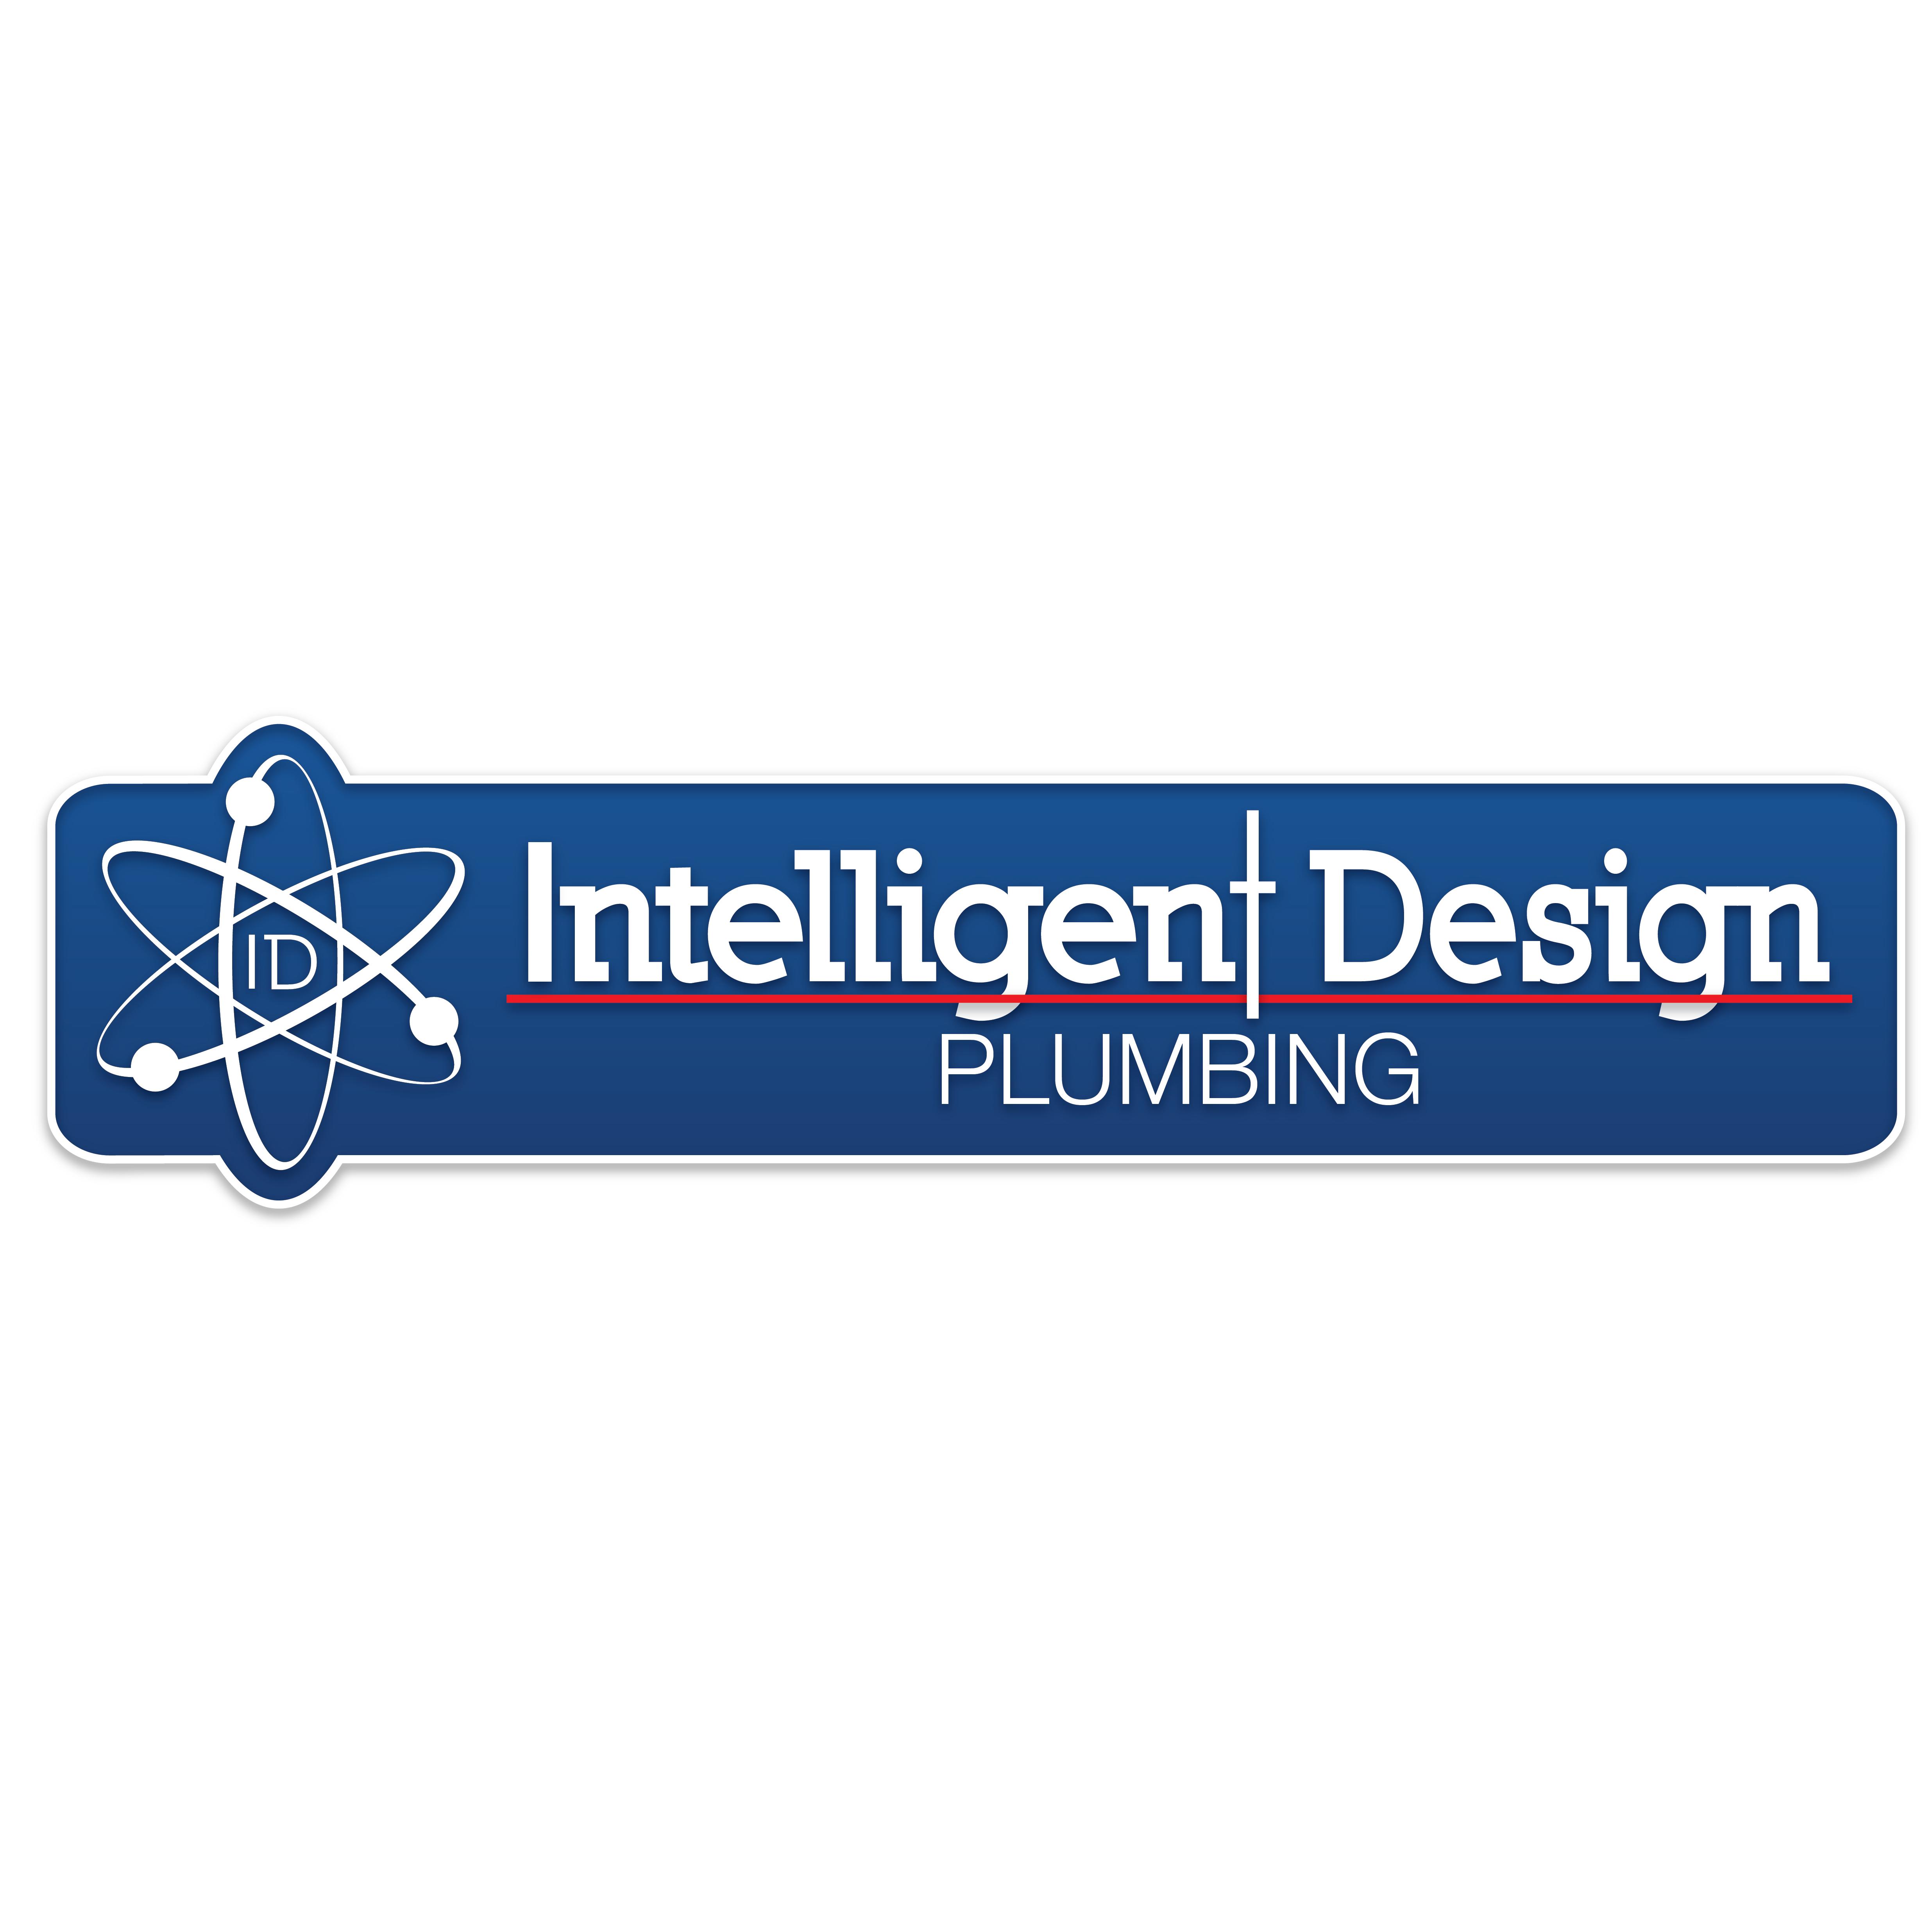 Intelligent Design Plumbing